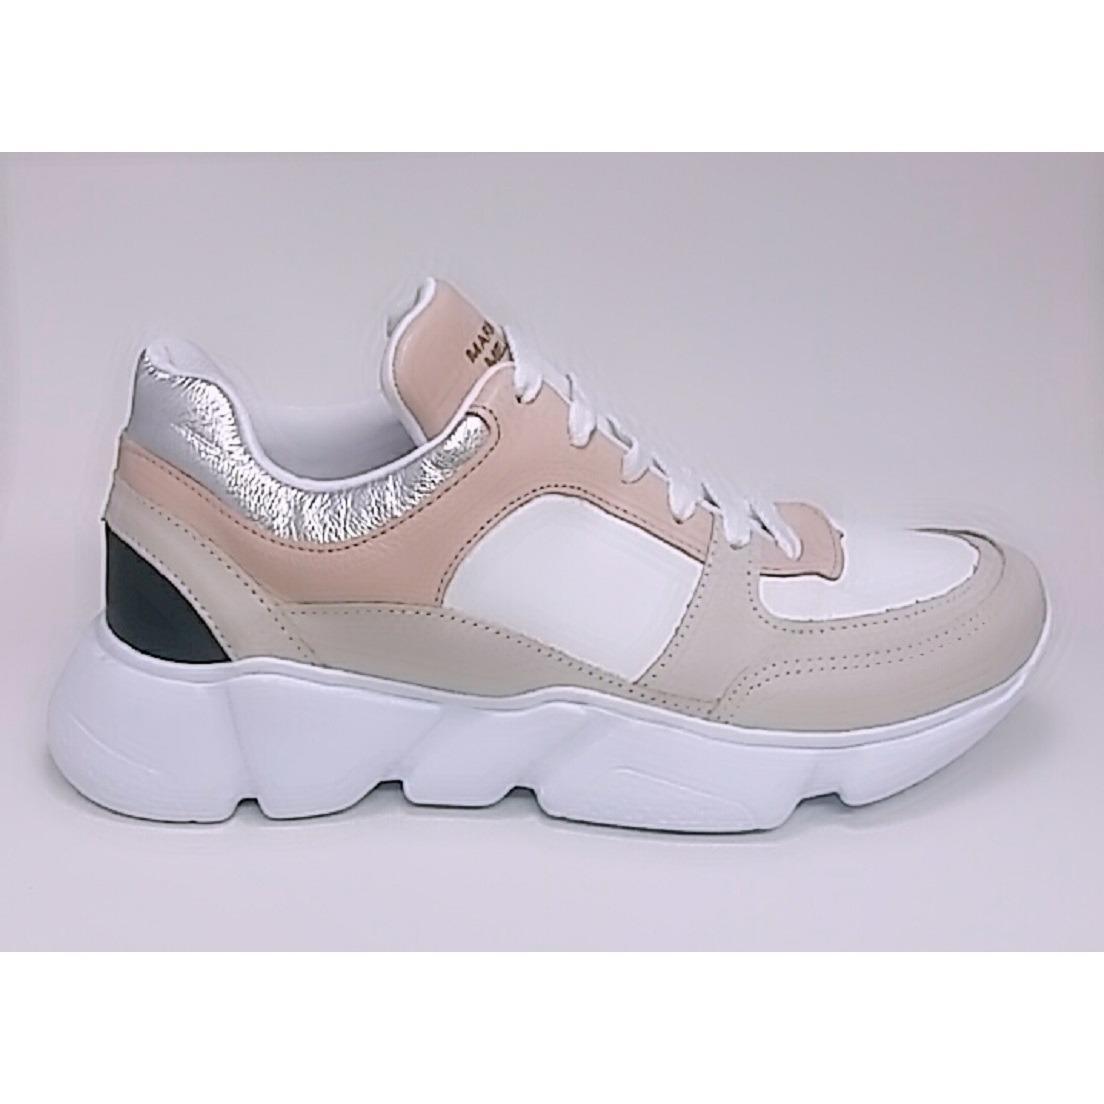 57fc658c4ba tênis feminino marina mello chunky sneaker couro. Carregando zoom.